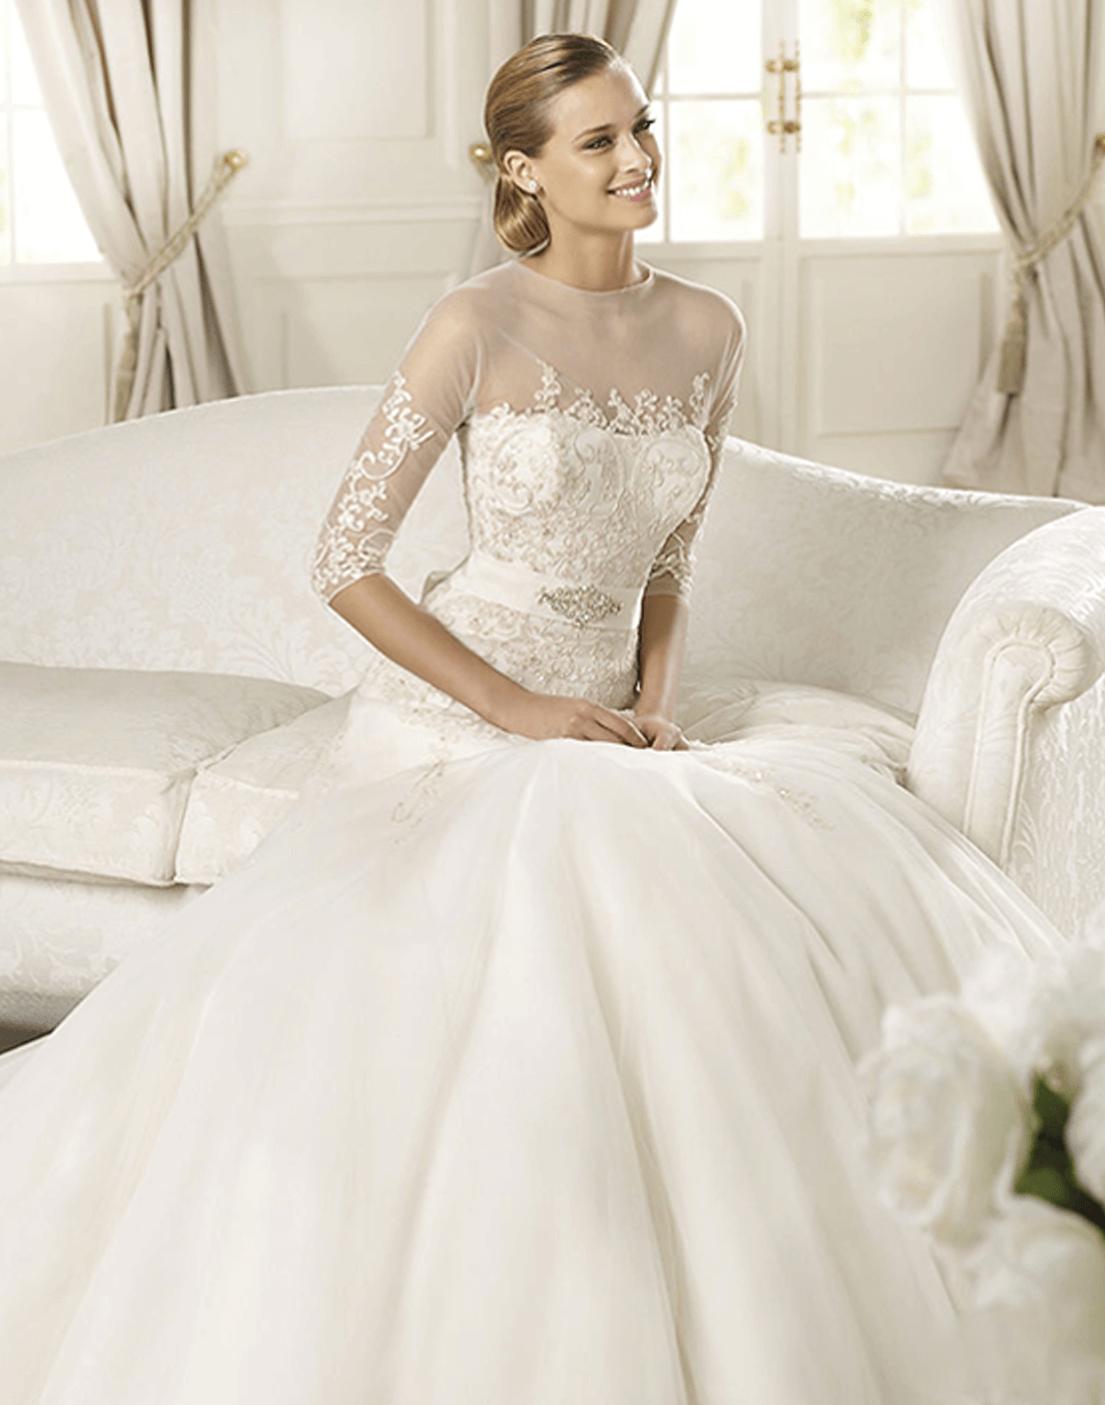 Wedding Lookbook photos